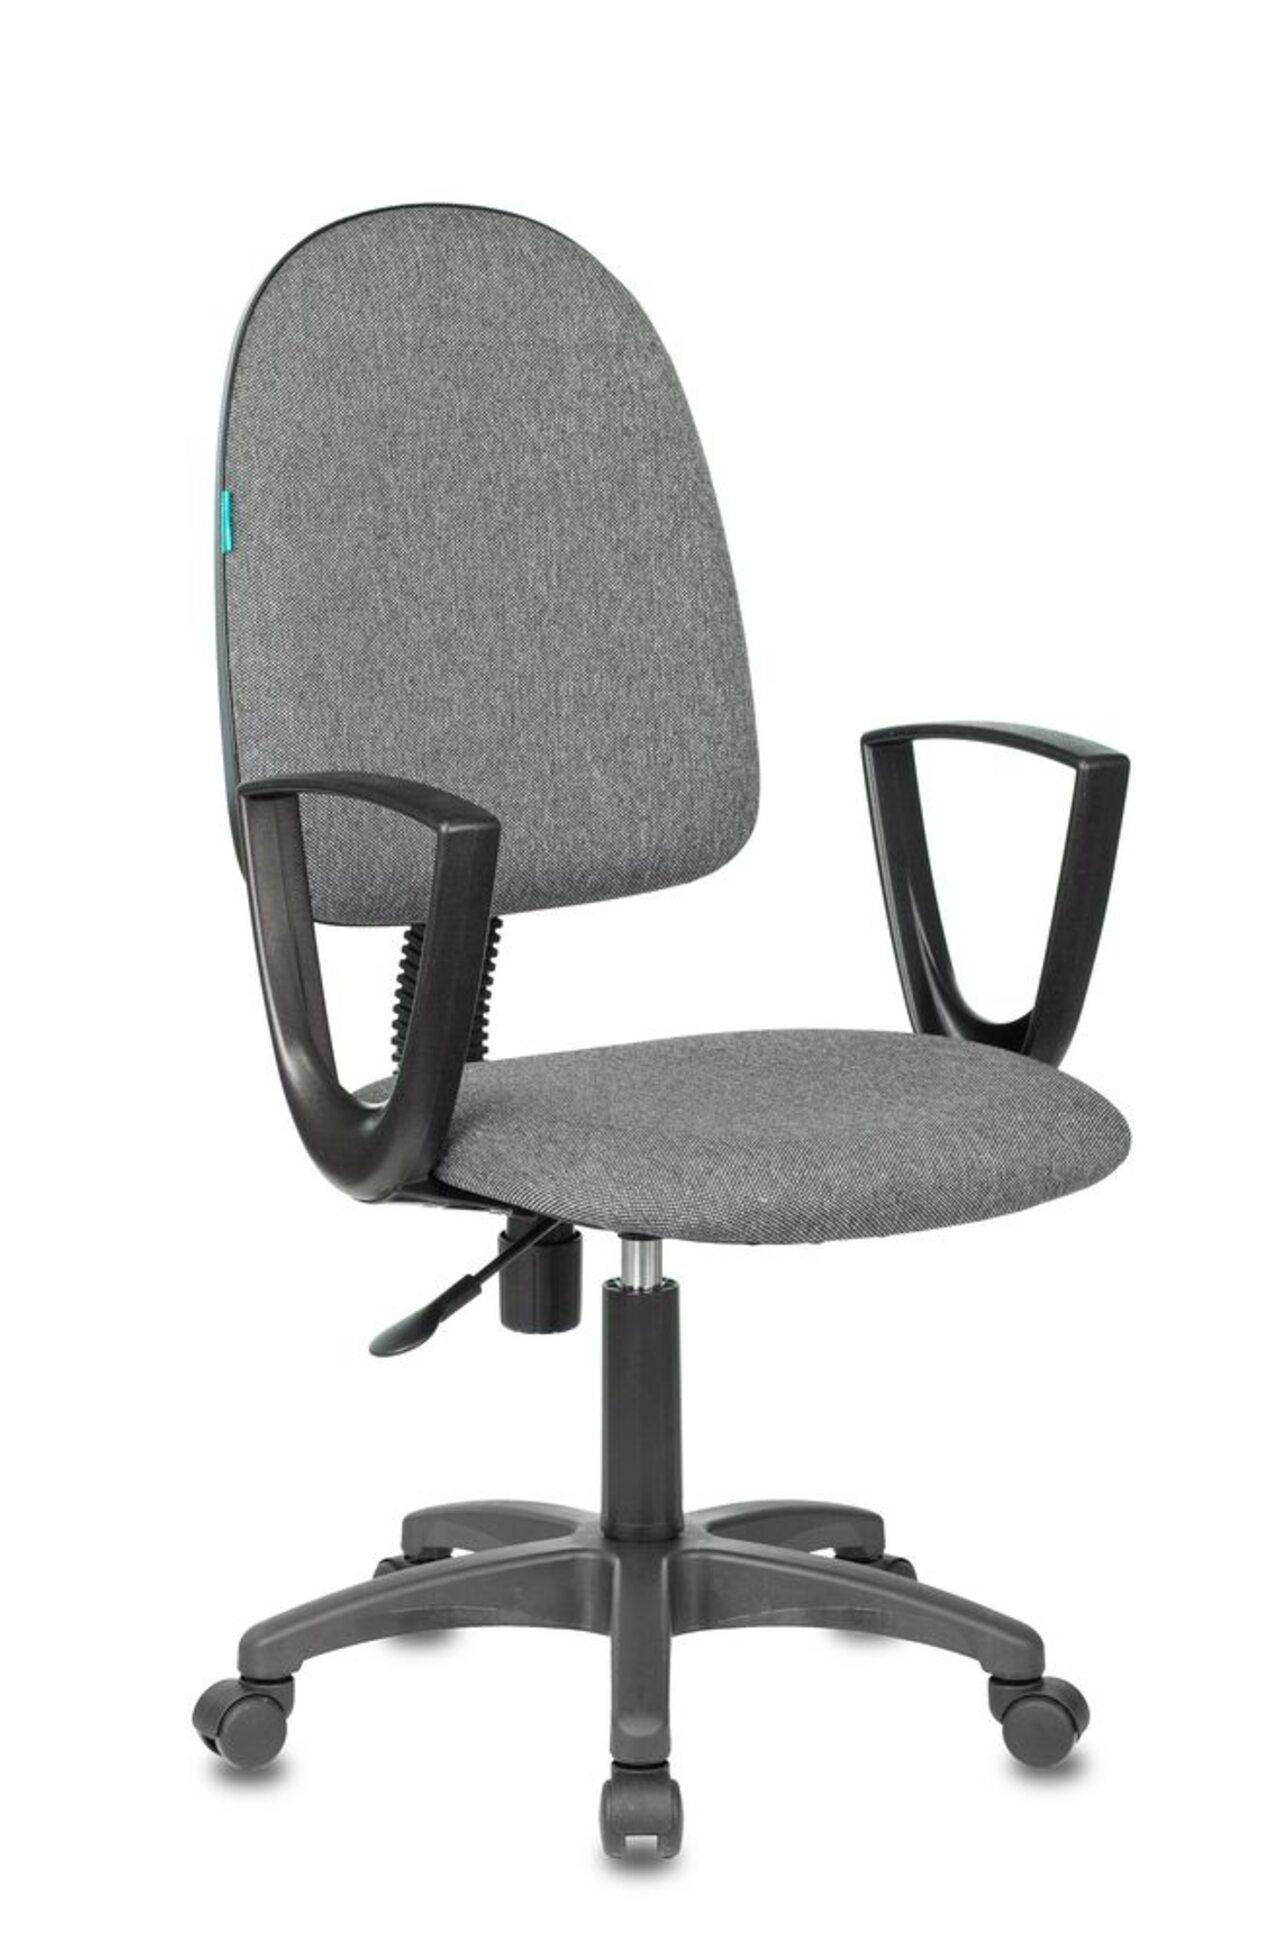 Кресло для персонала CH-1300N/3C - фото 5